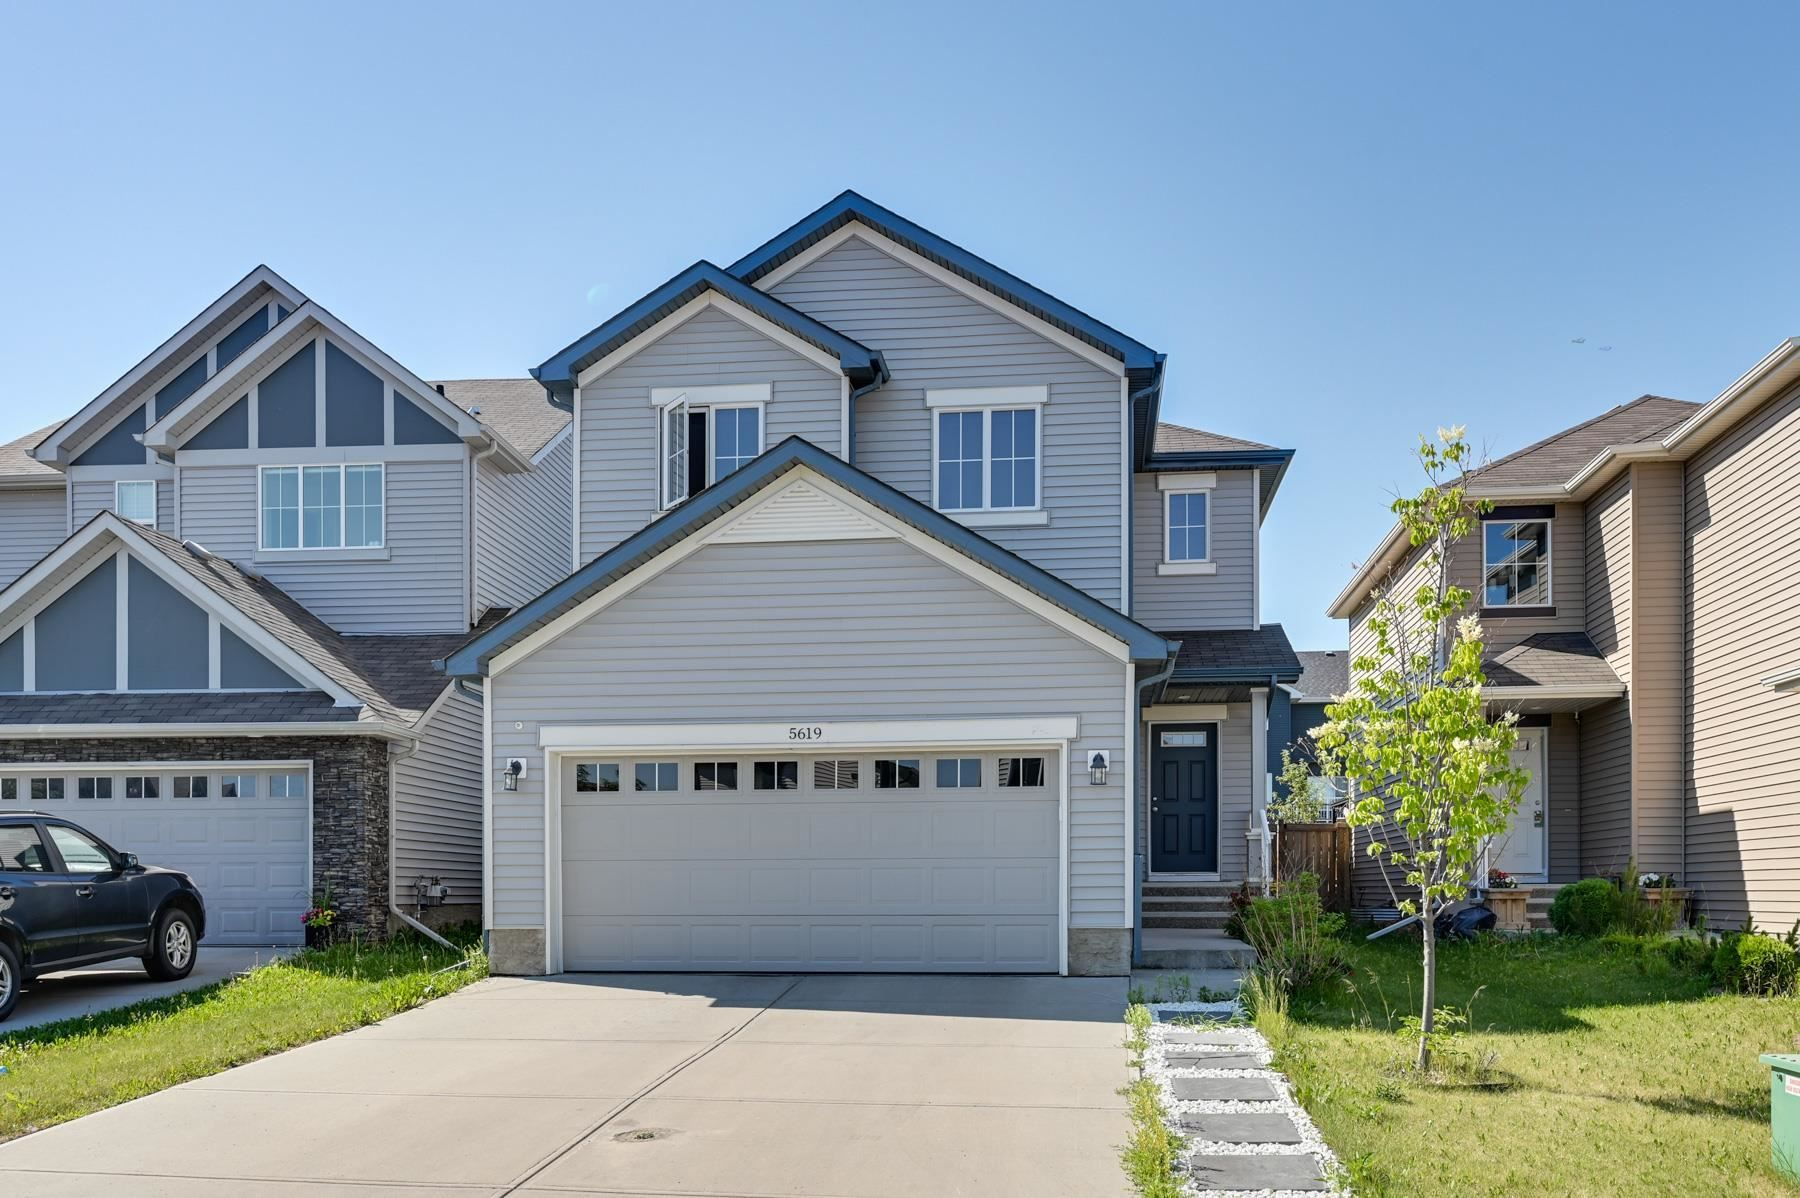 Main Photo: 5619 18 Avenue in Edmonton: Zone 53 House for sale : MLS®# E4252576